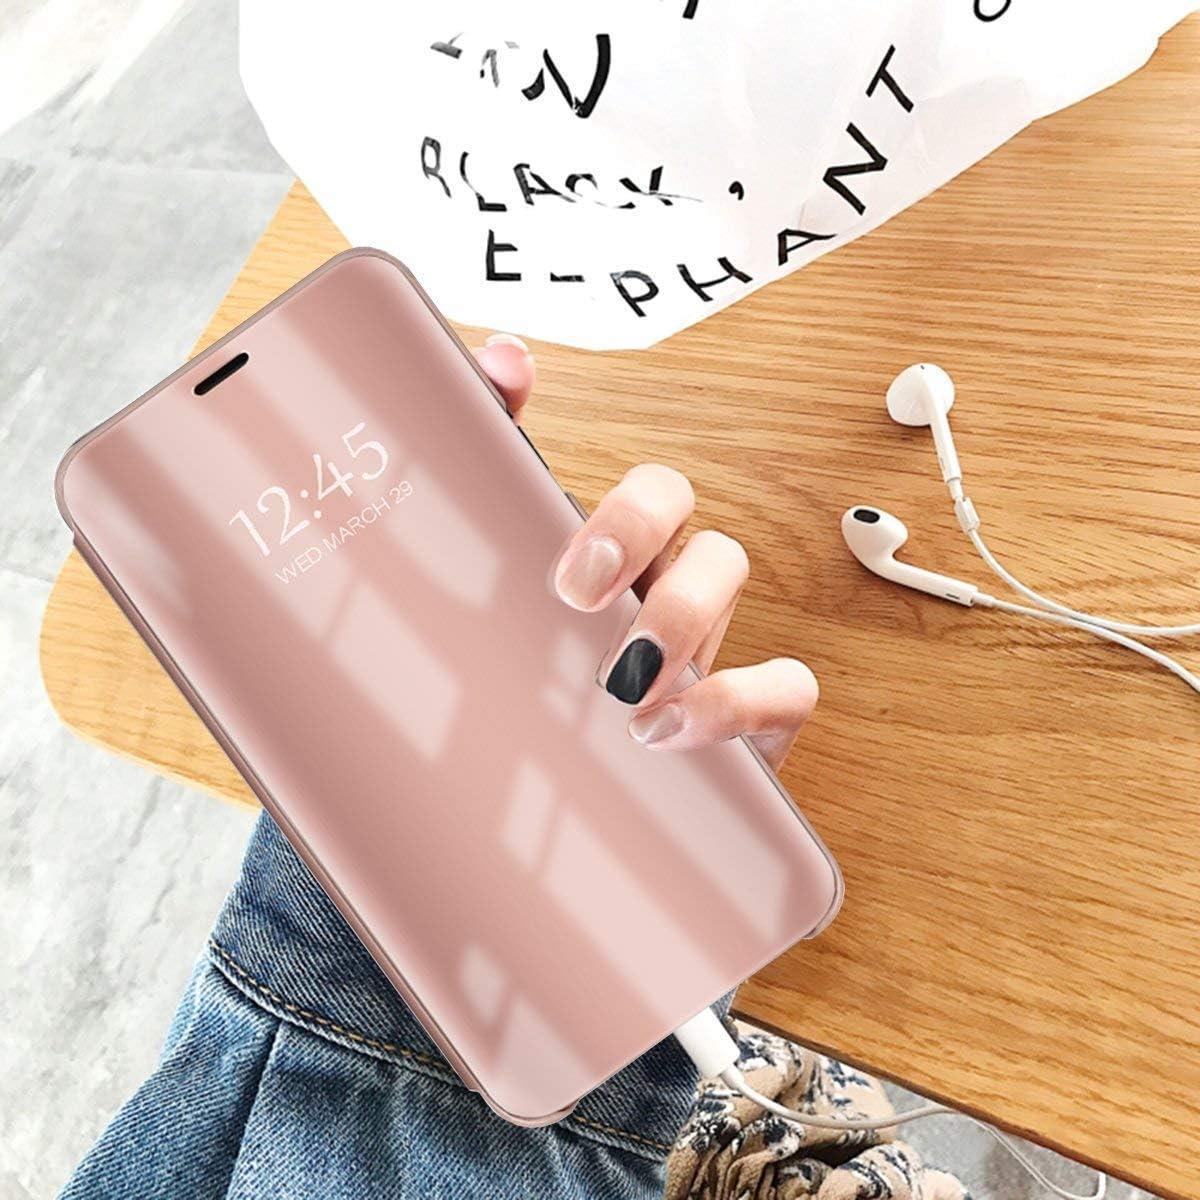 Argent Suhctup Coque Compatible pour Samsung Galaxy Note 9 Transparente Clear View Housse Etui Support /à Rabat Cover Flip Case 360/° Compl/ète Protection Anti-Choc Anti-Rayures Cover